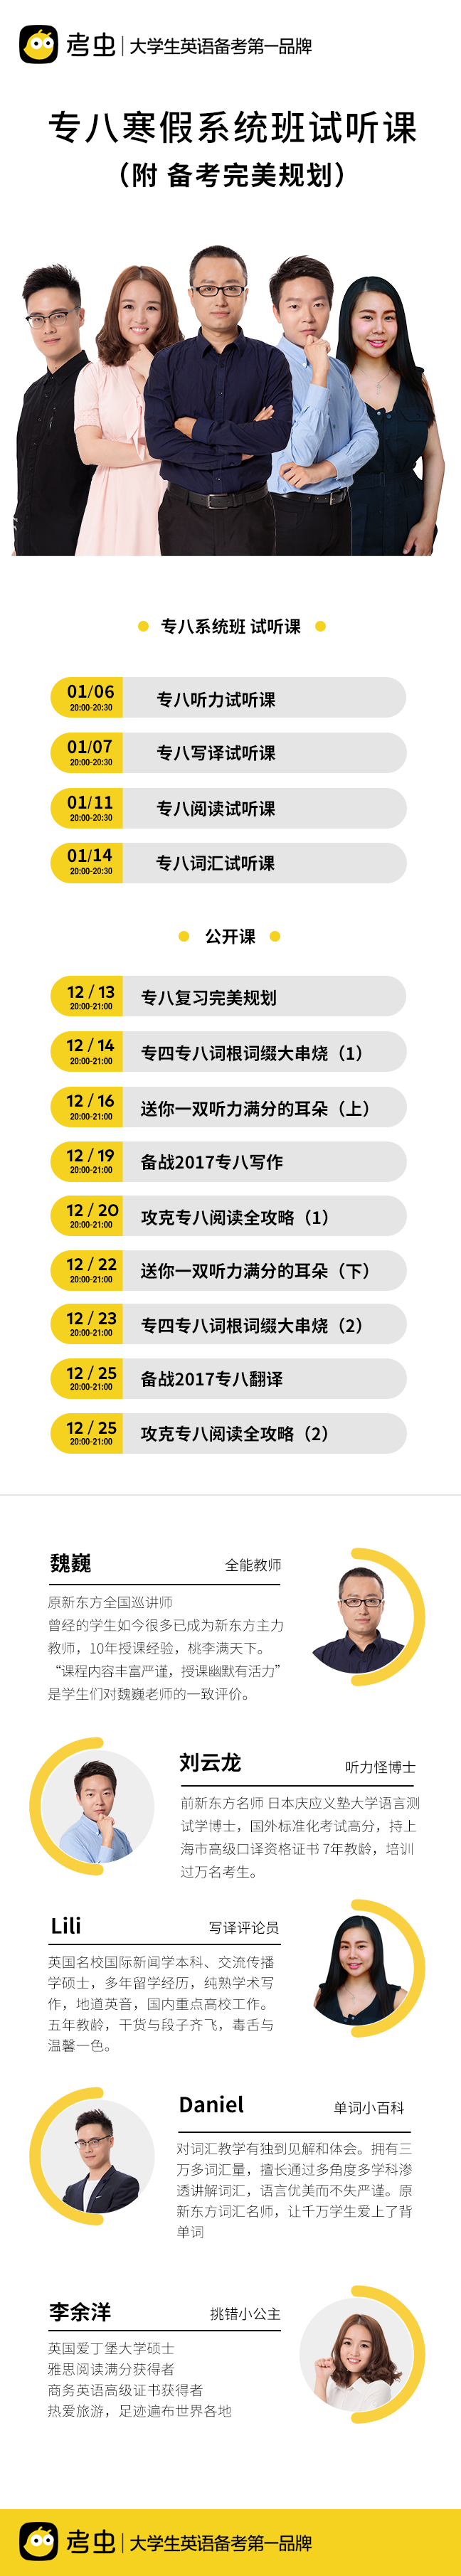 Z8-公开课.png